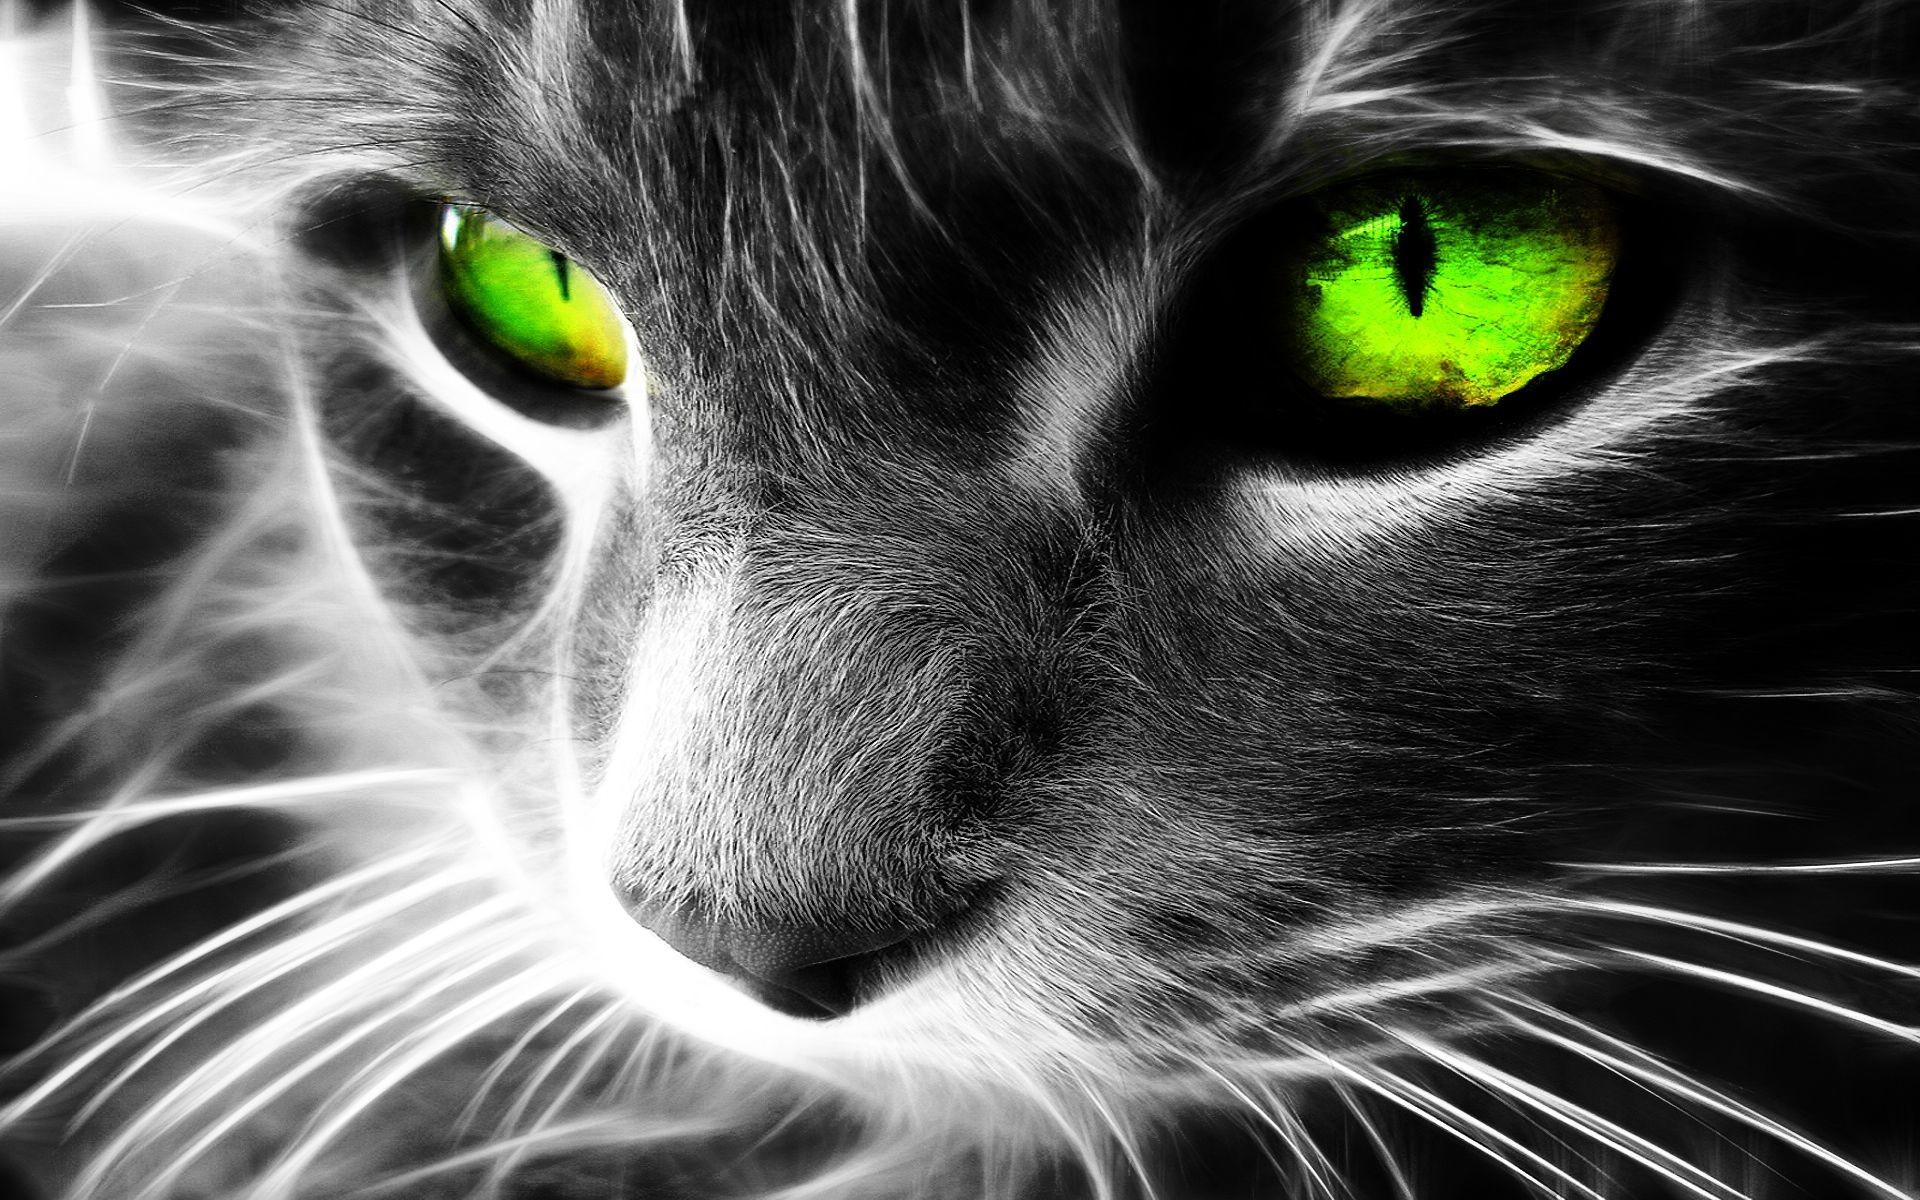 cool cat wallpapers HD download cool desktop wallpapers